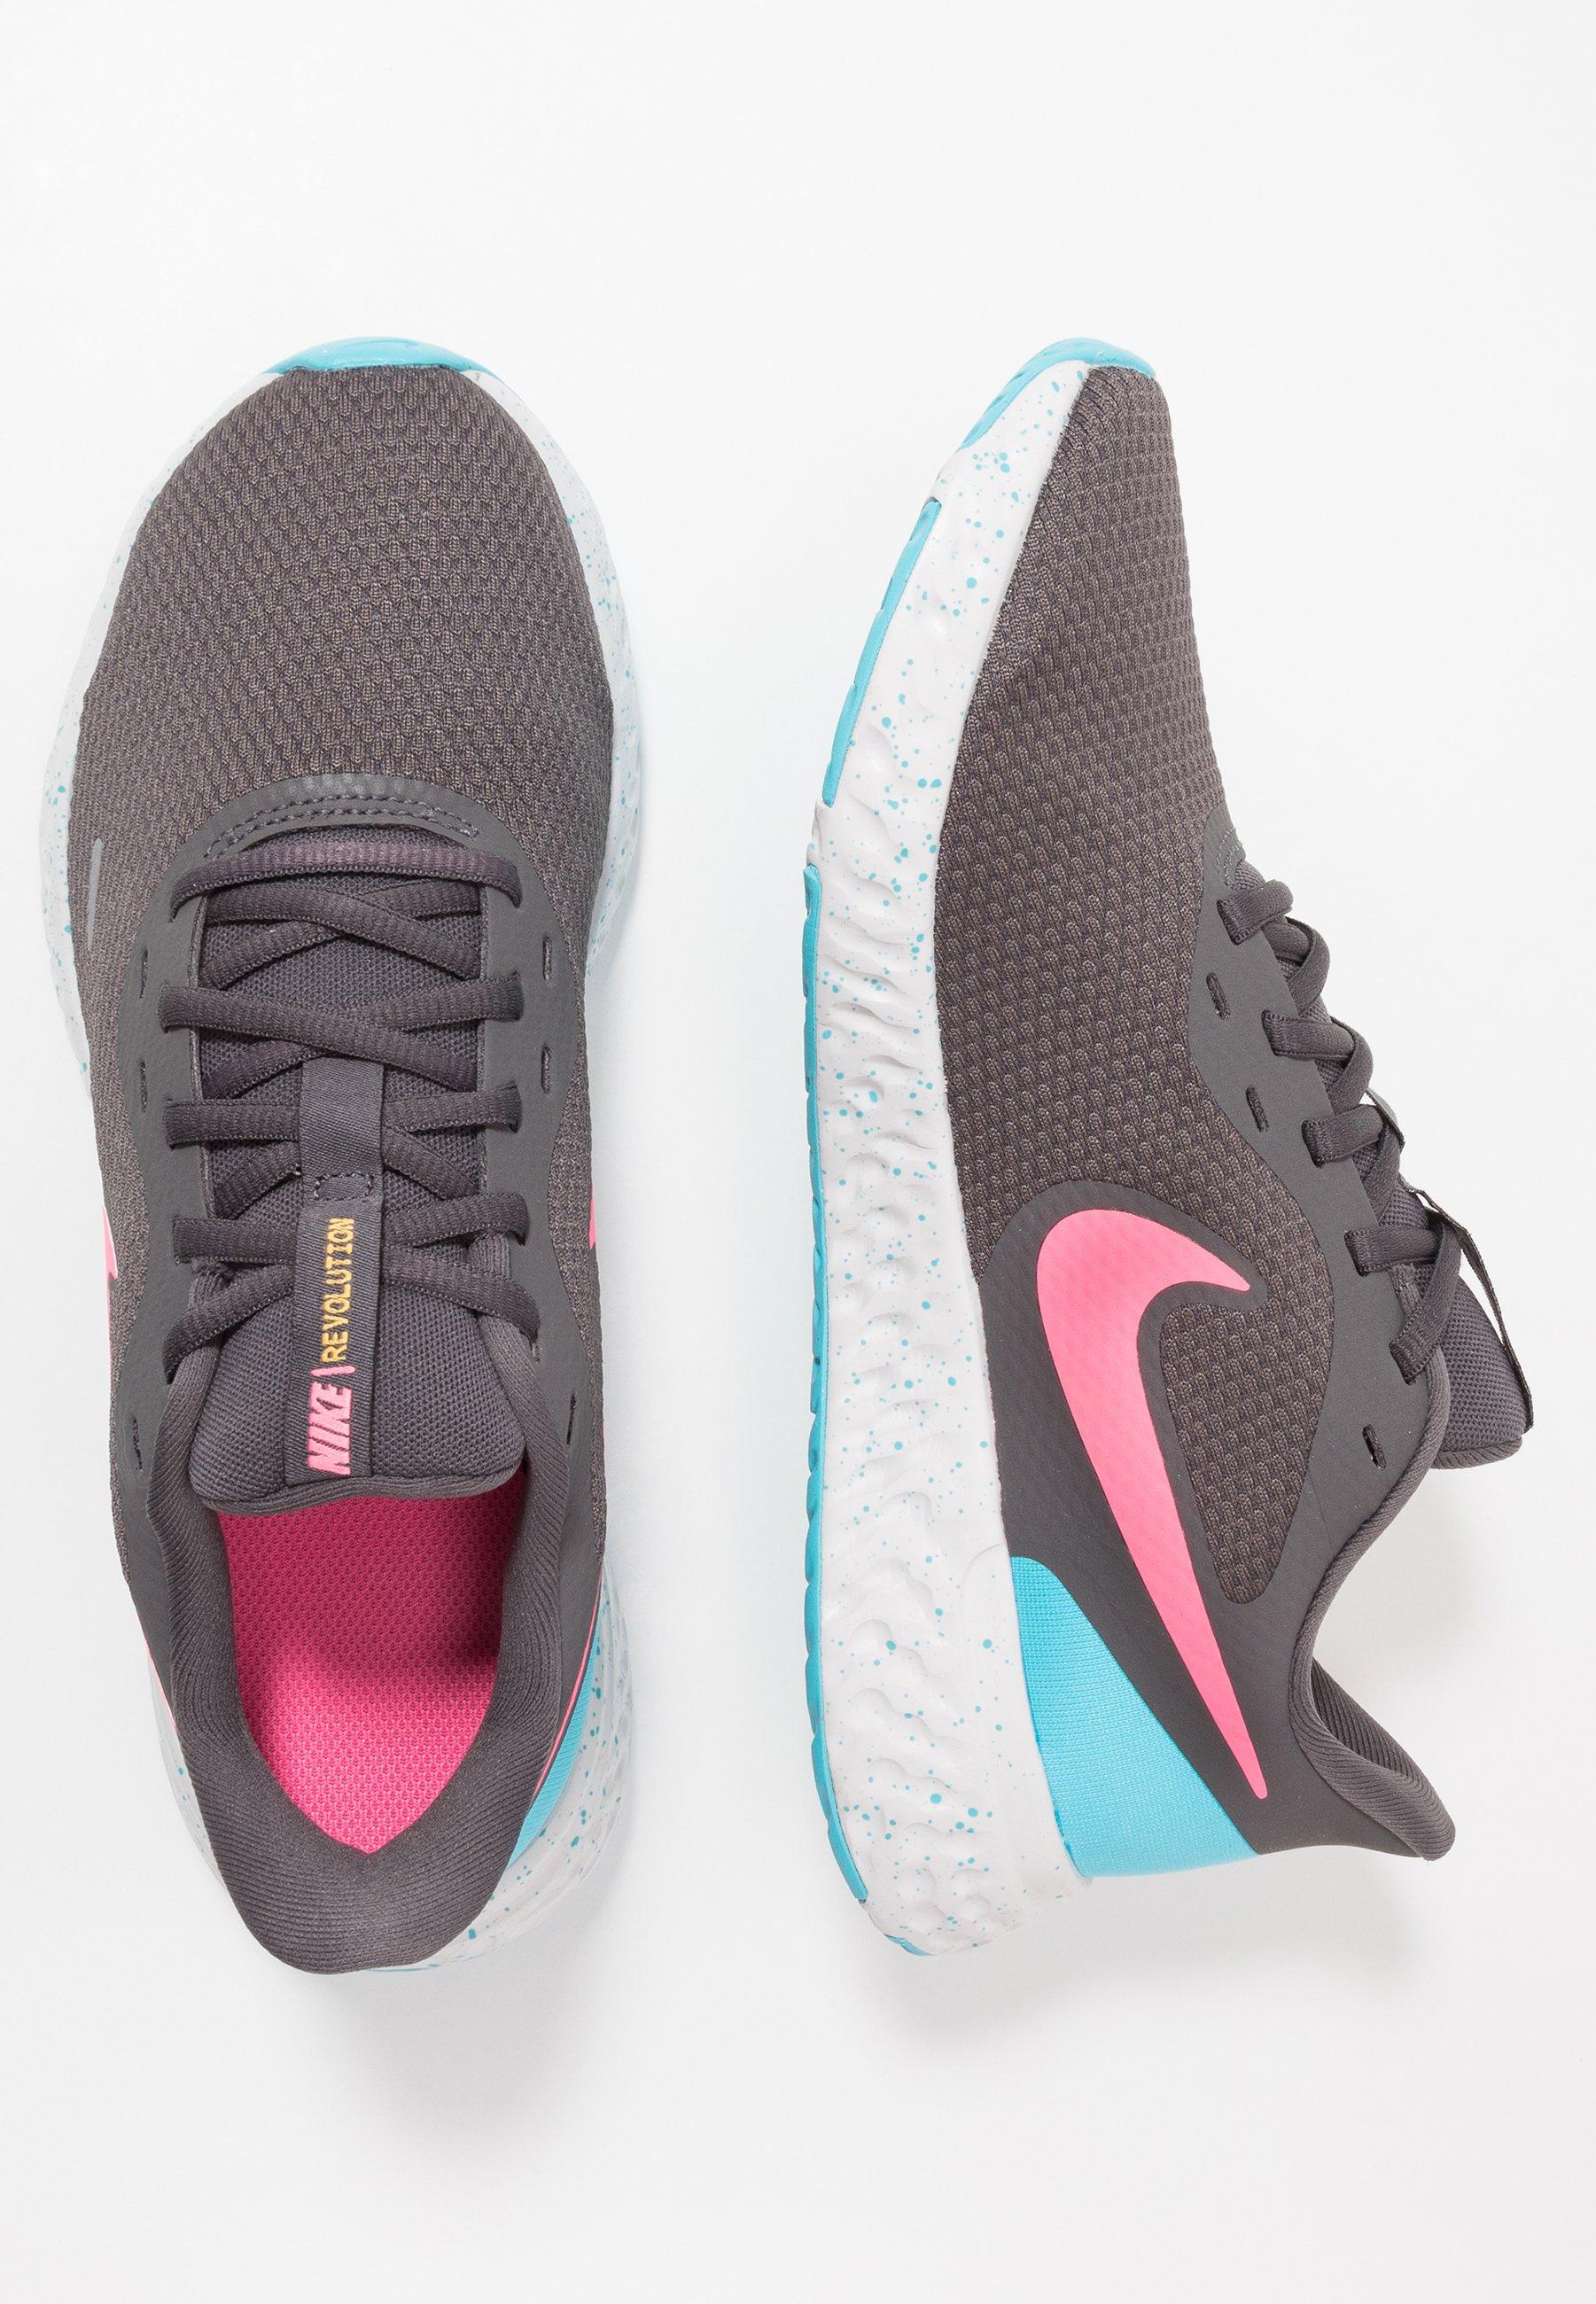 REVOLUTION 5 Chaussures de running neutres thunder greydigital pinkblue furysilver lilacvast greylaser orange